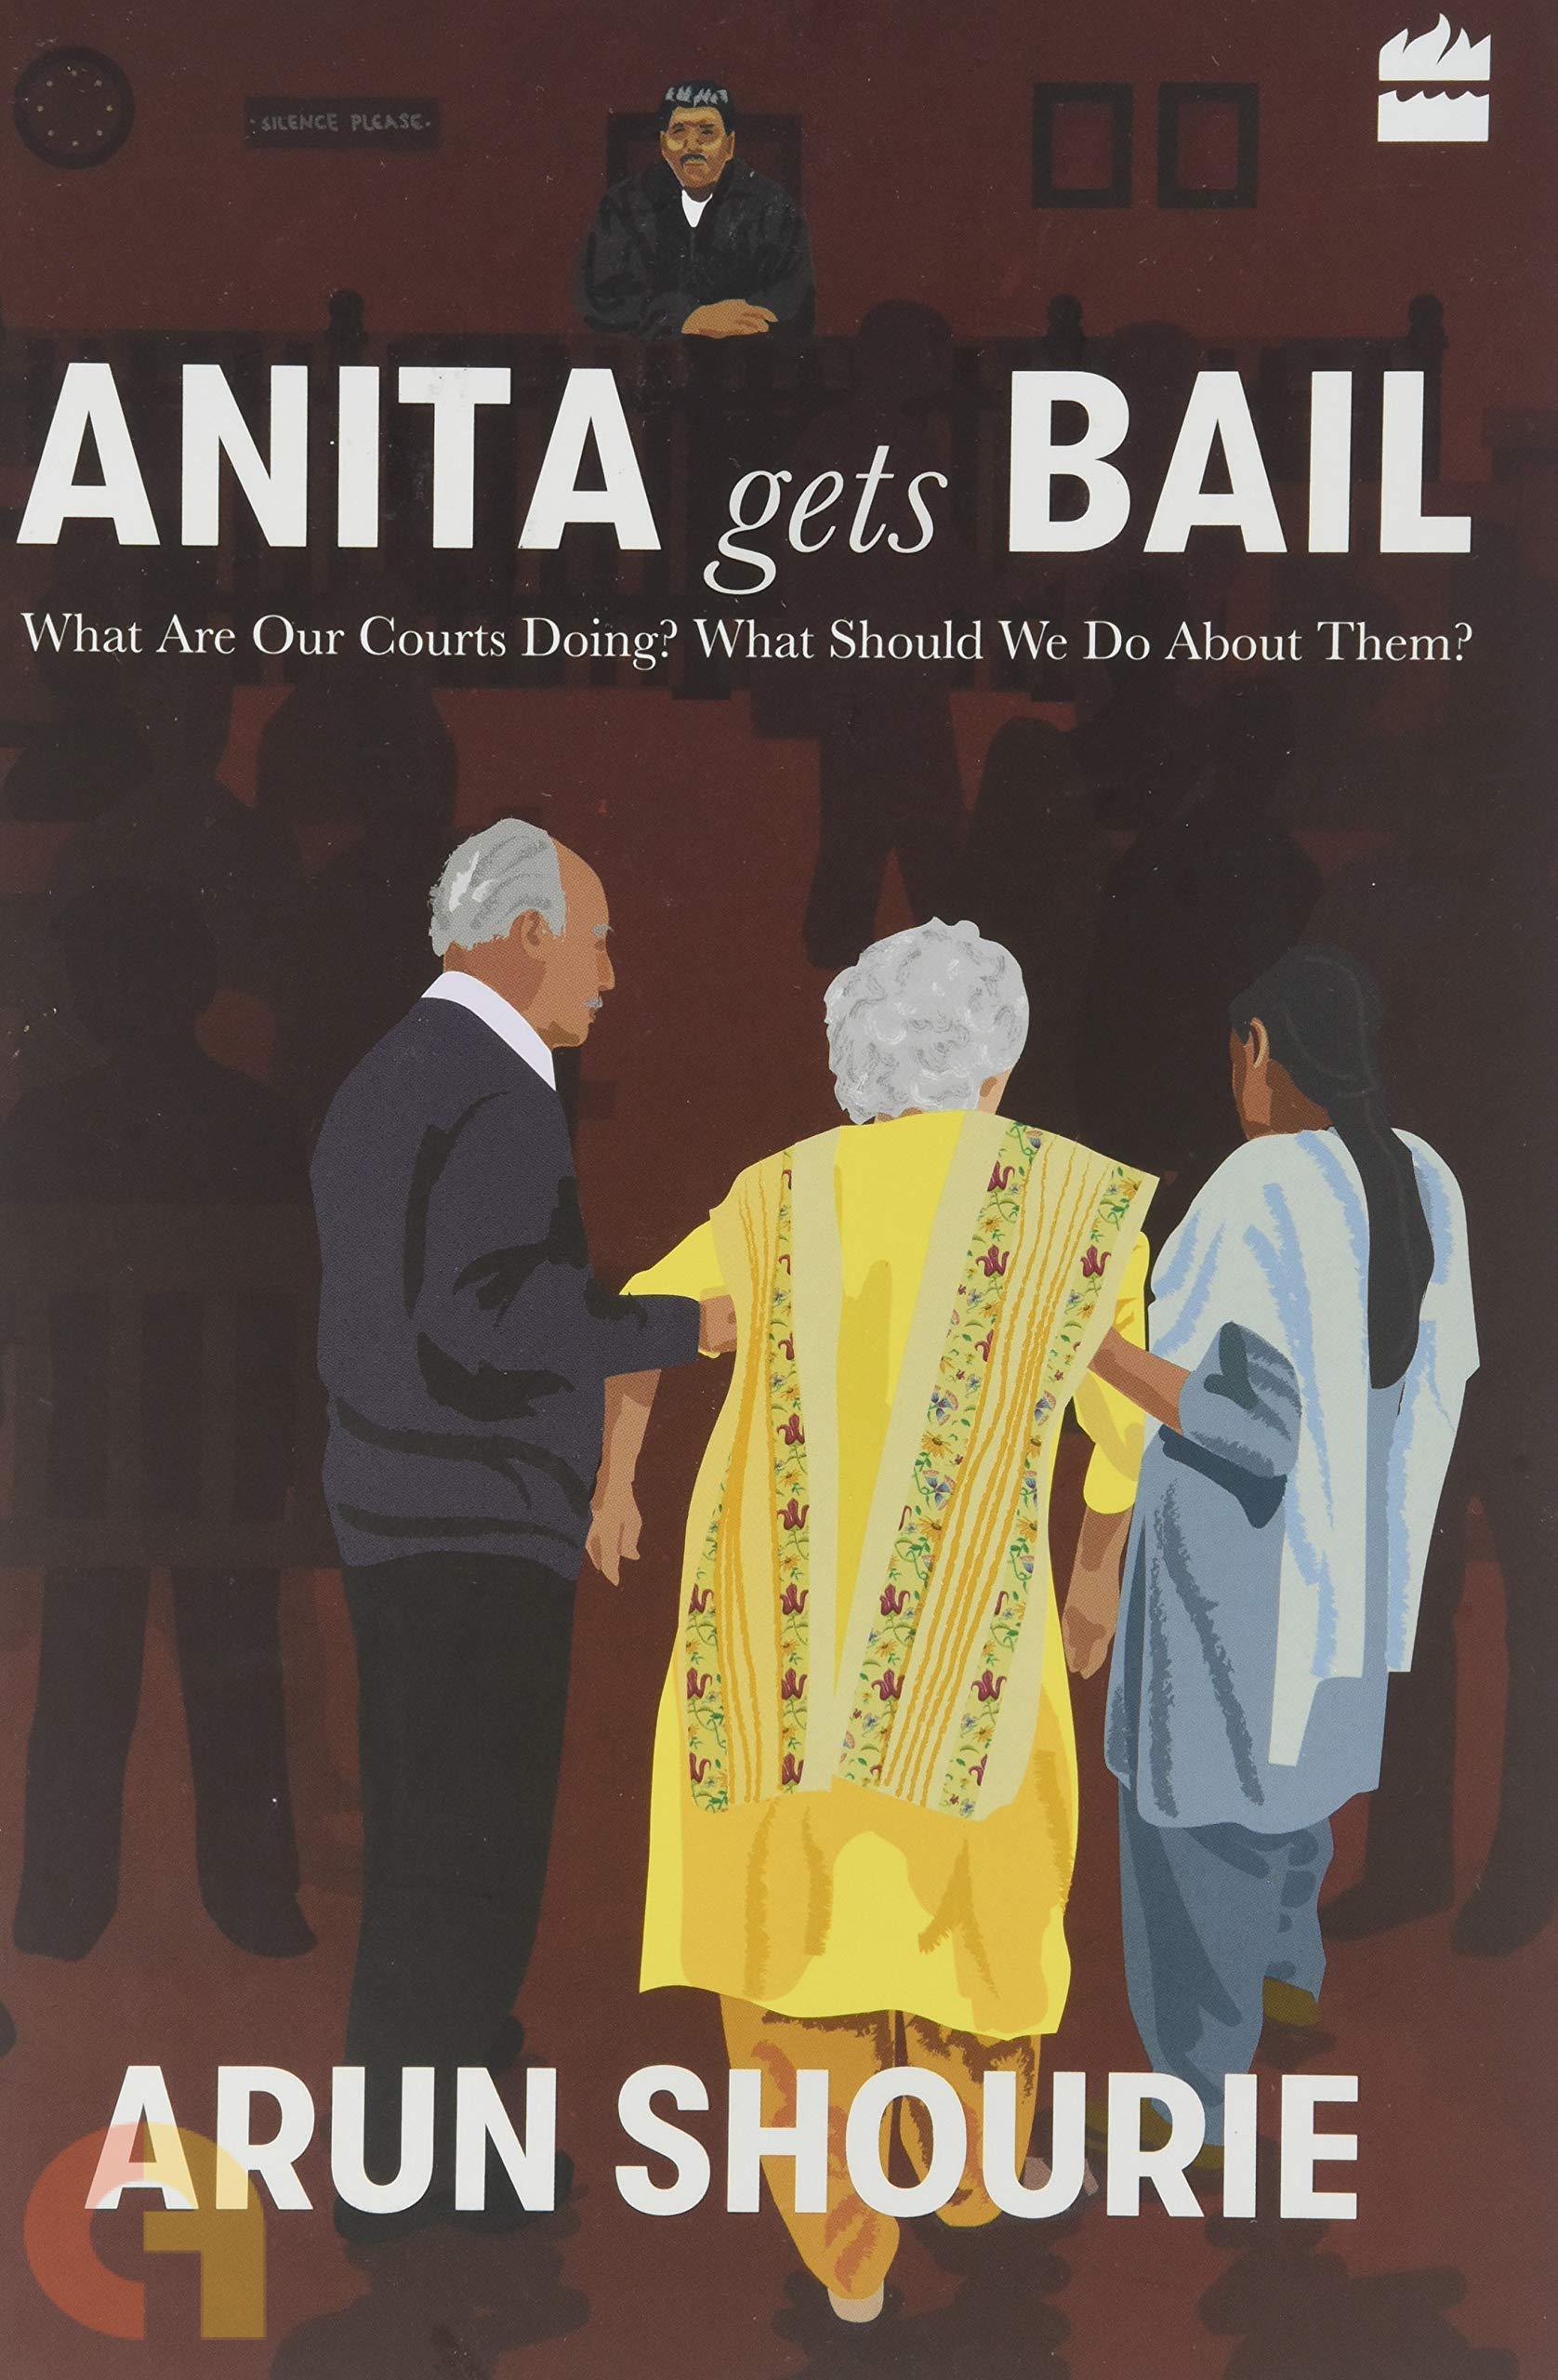 ANITA GETS BAIL